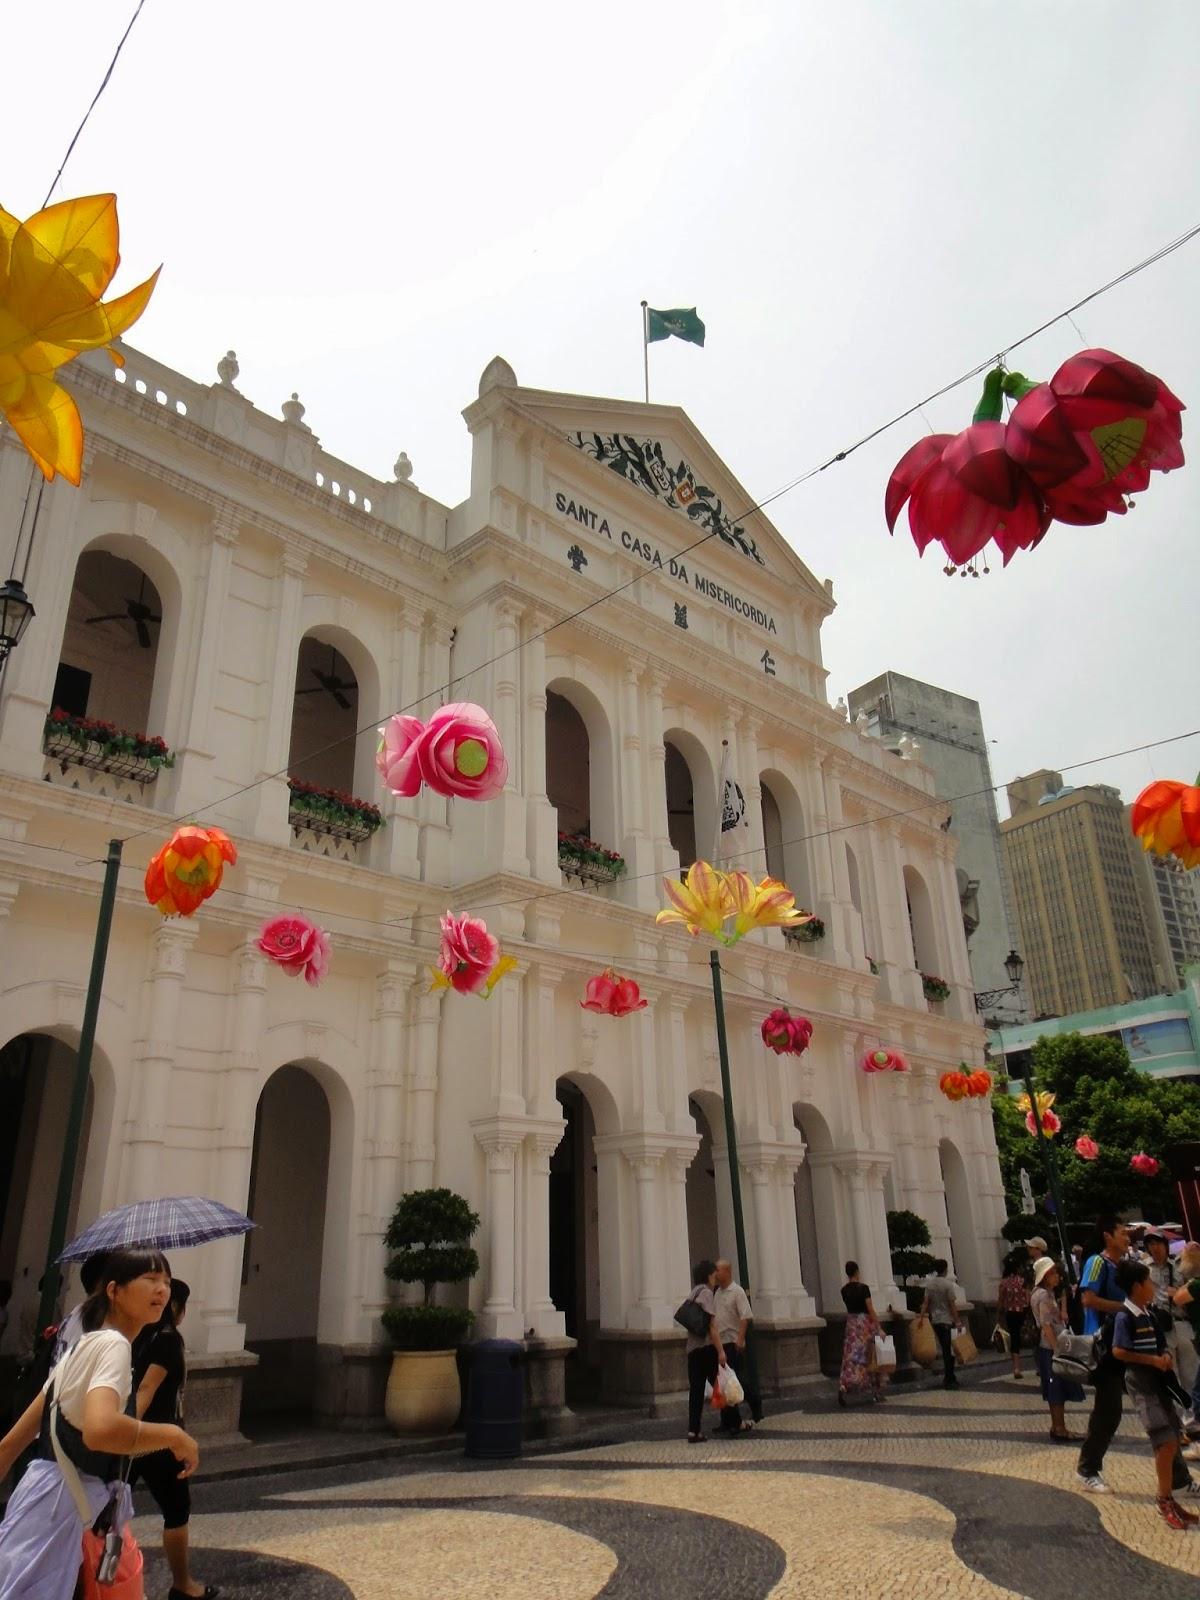 The Holy House of Mercy Macau